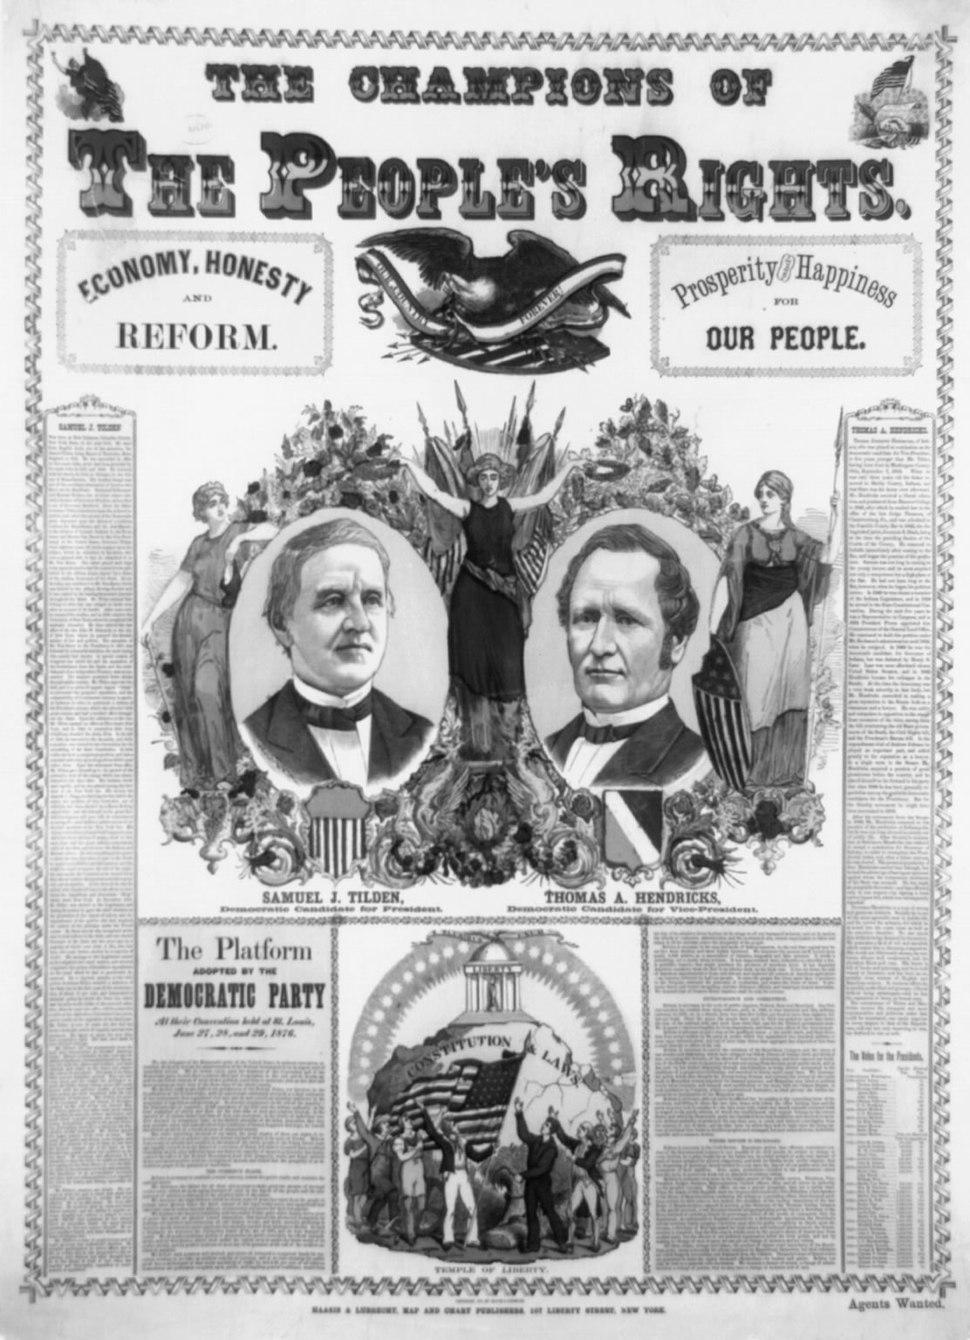 Tilden and Hendricks campaign poster